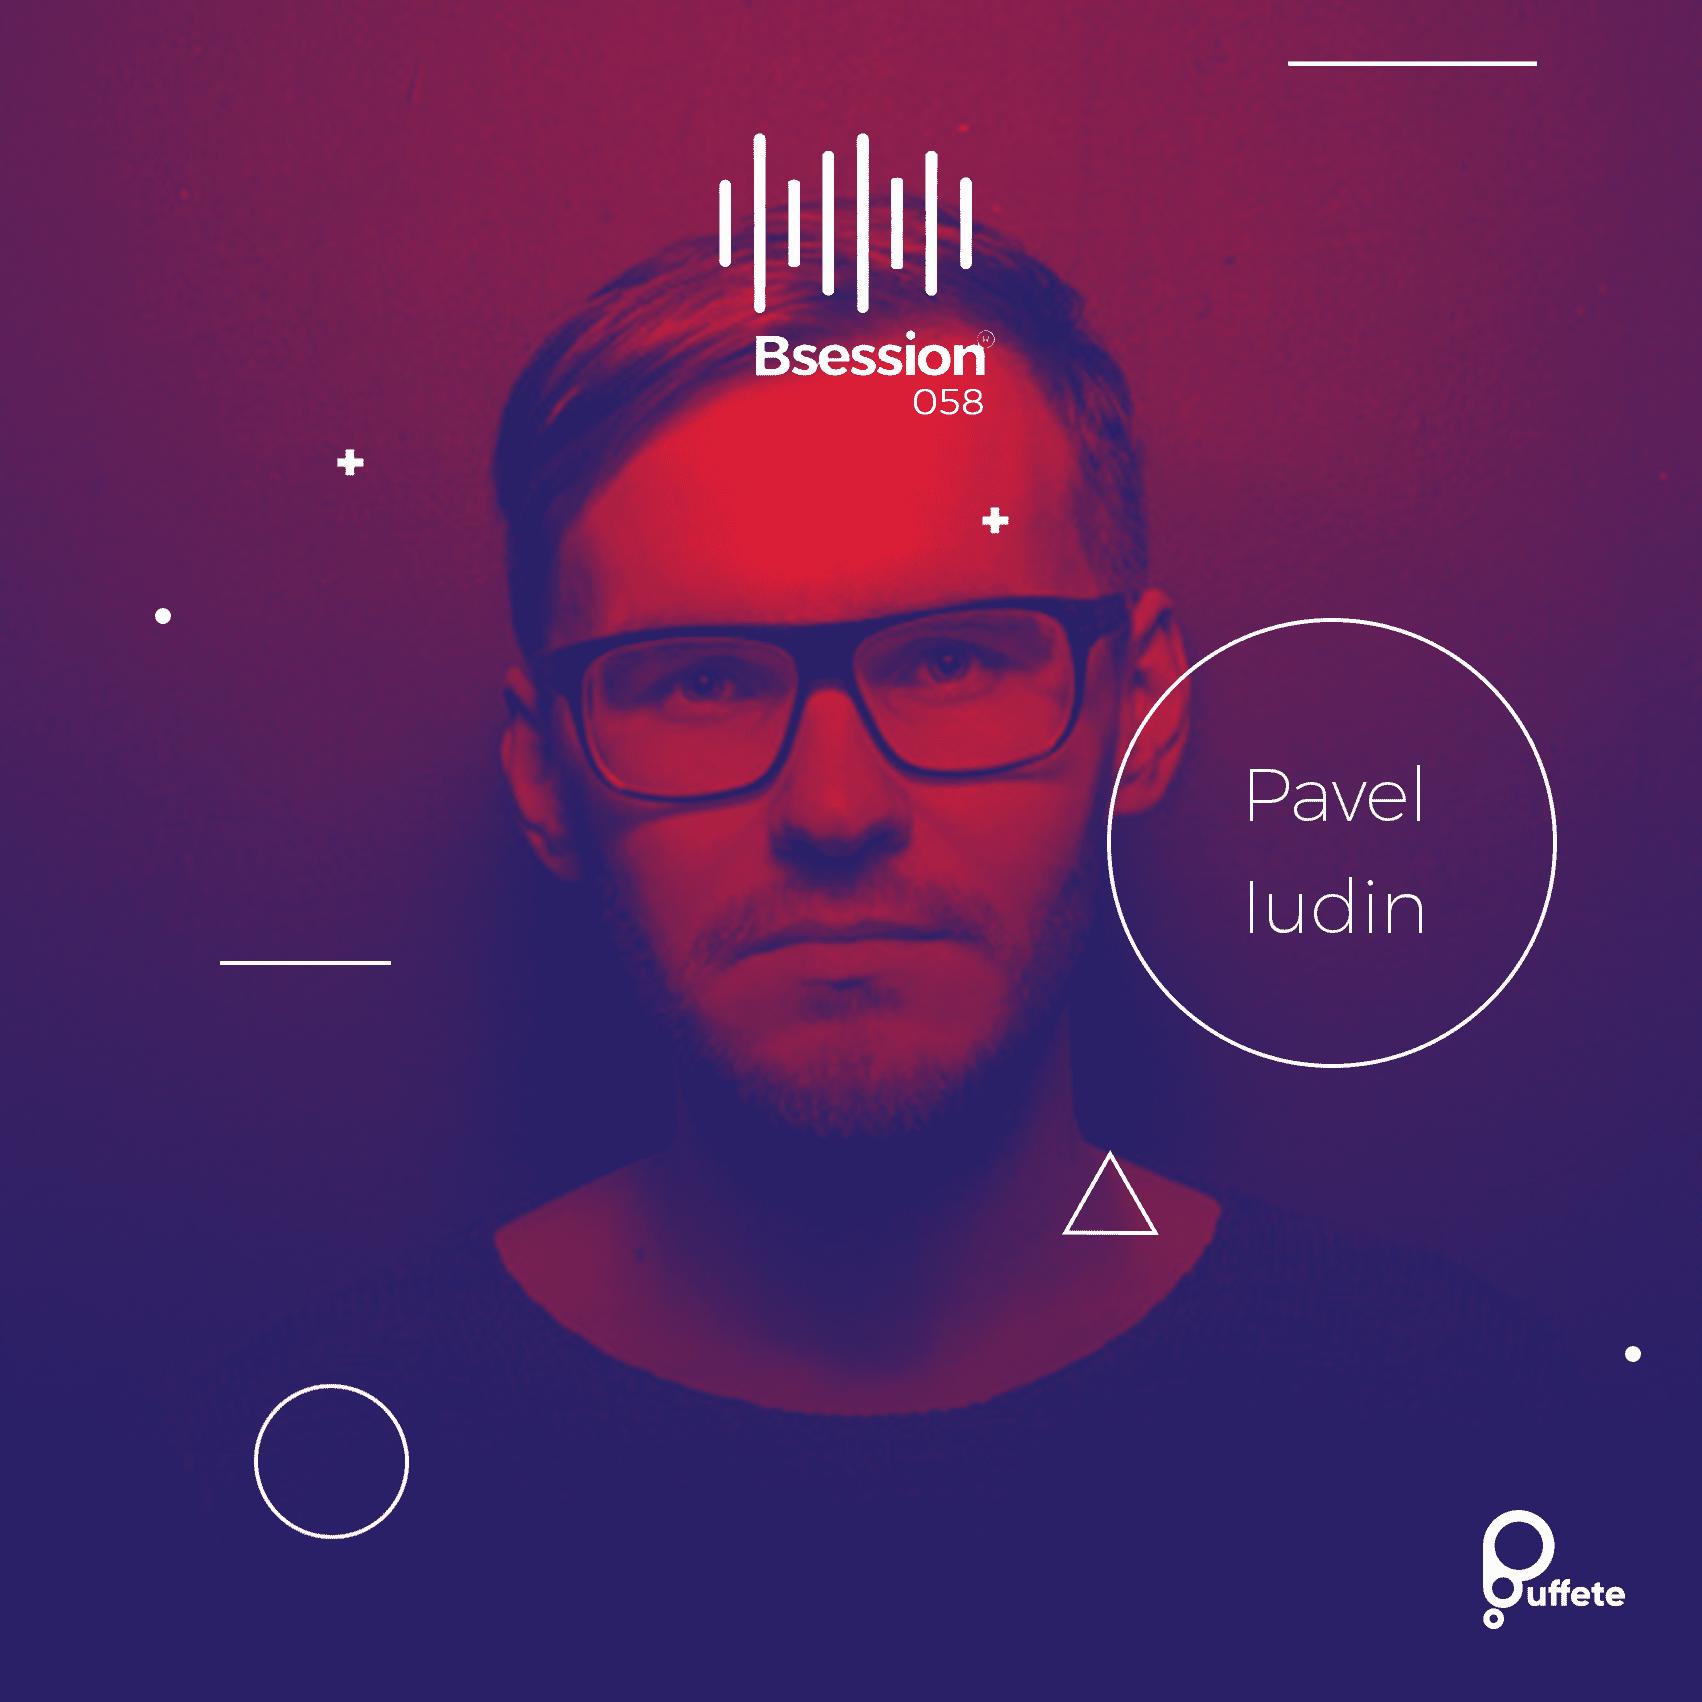 Bsession 058 - Pavel Iudin | Berg Audio